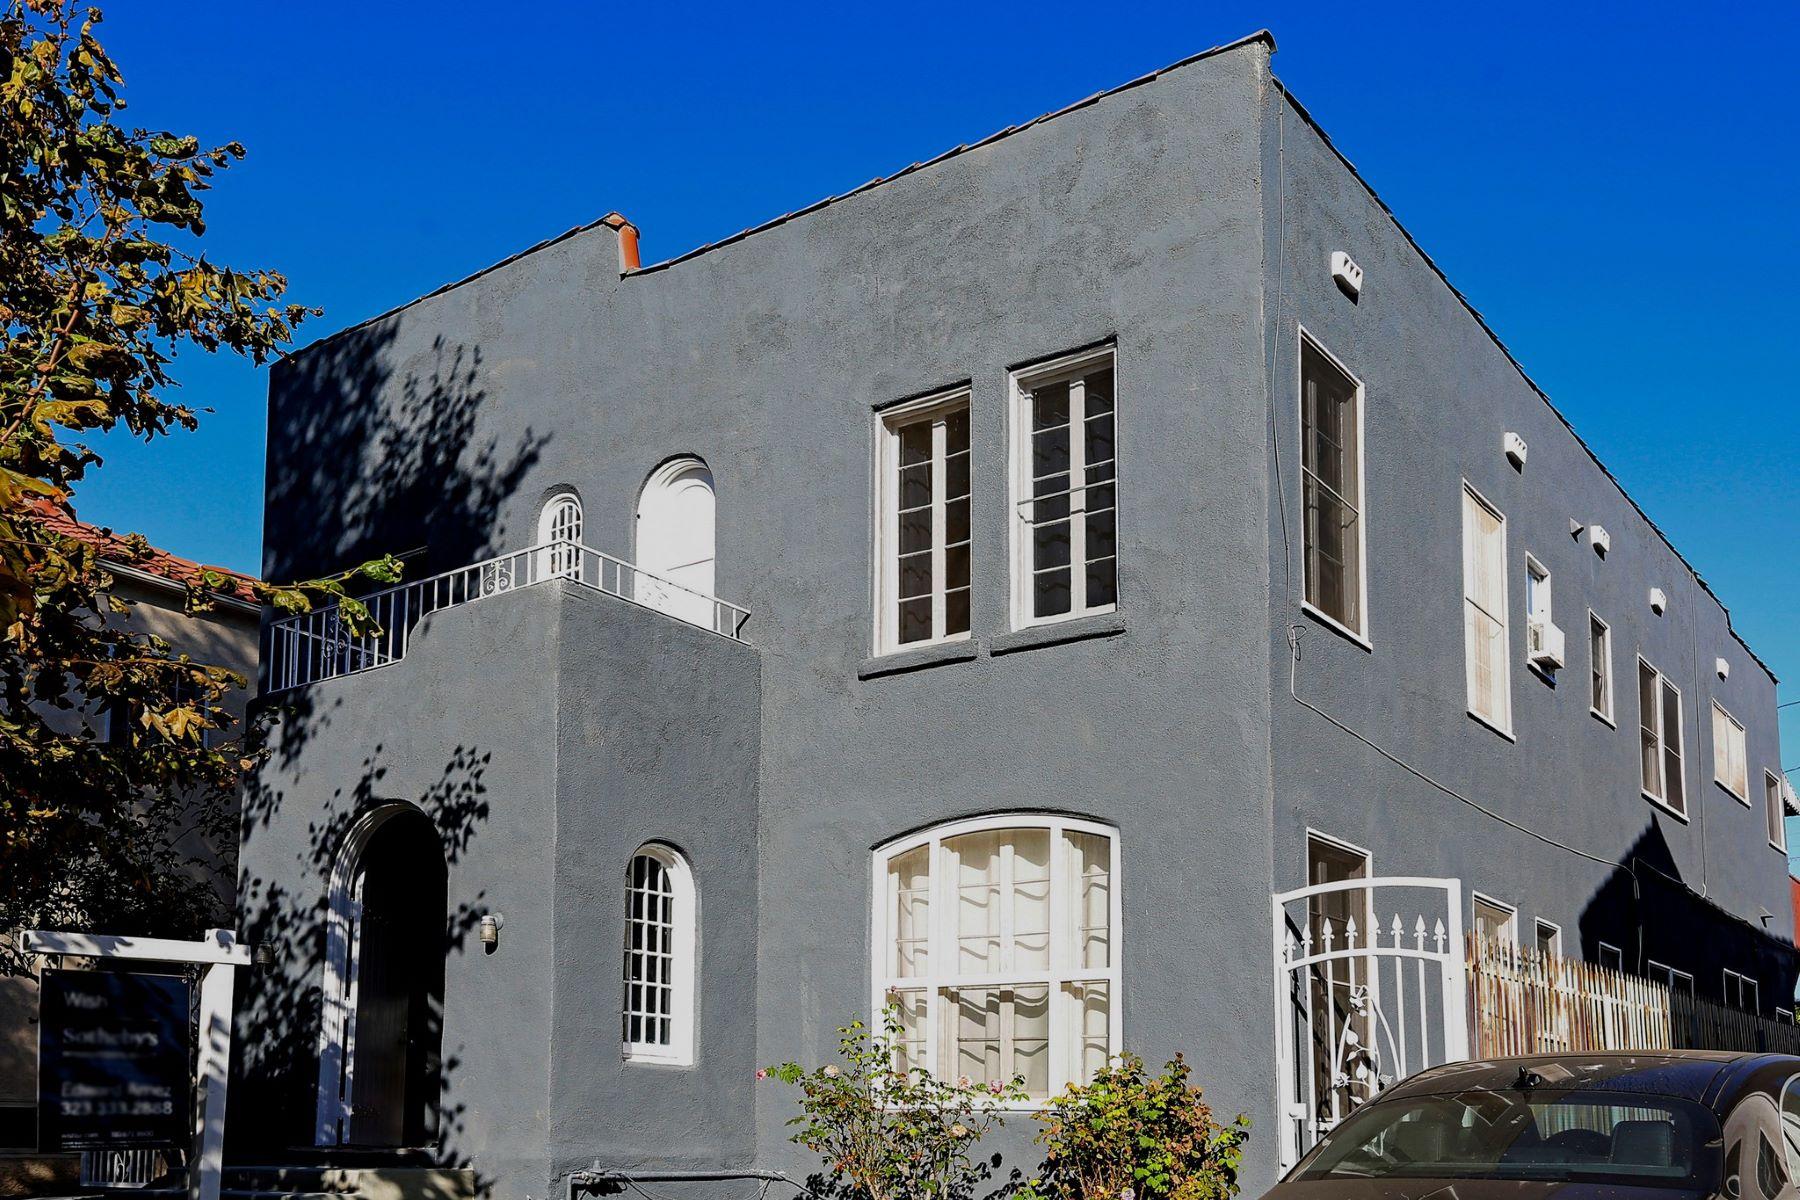 Duplex Homes 为 销售 在 906 S Sycamore Avenue 洛杉矶, 加利福尼亚州 90036 美国